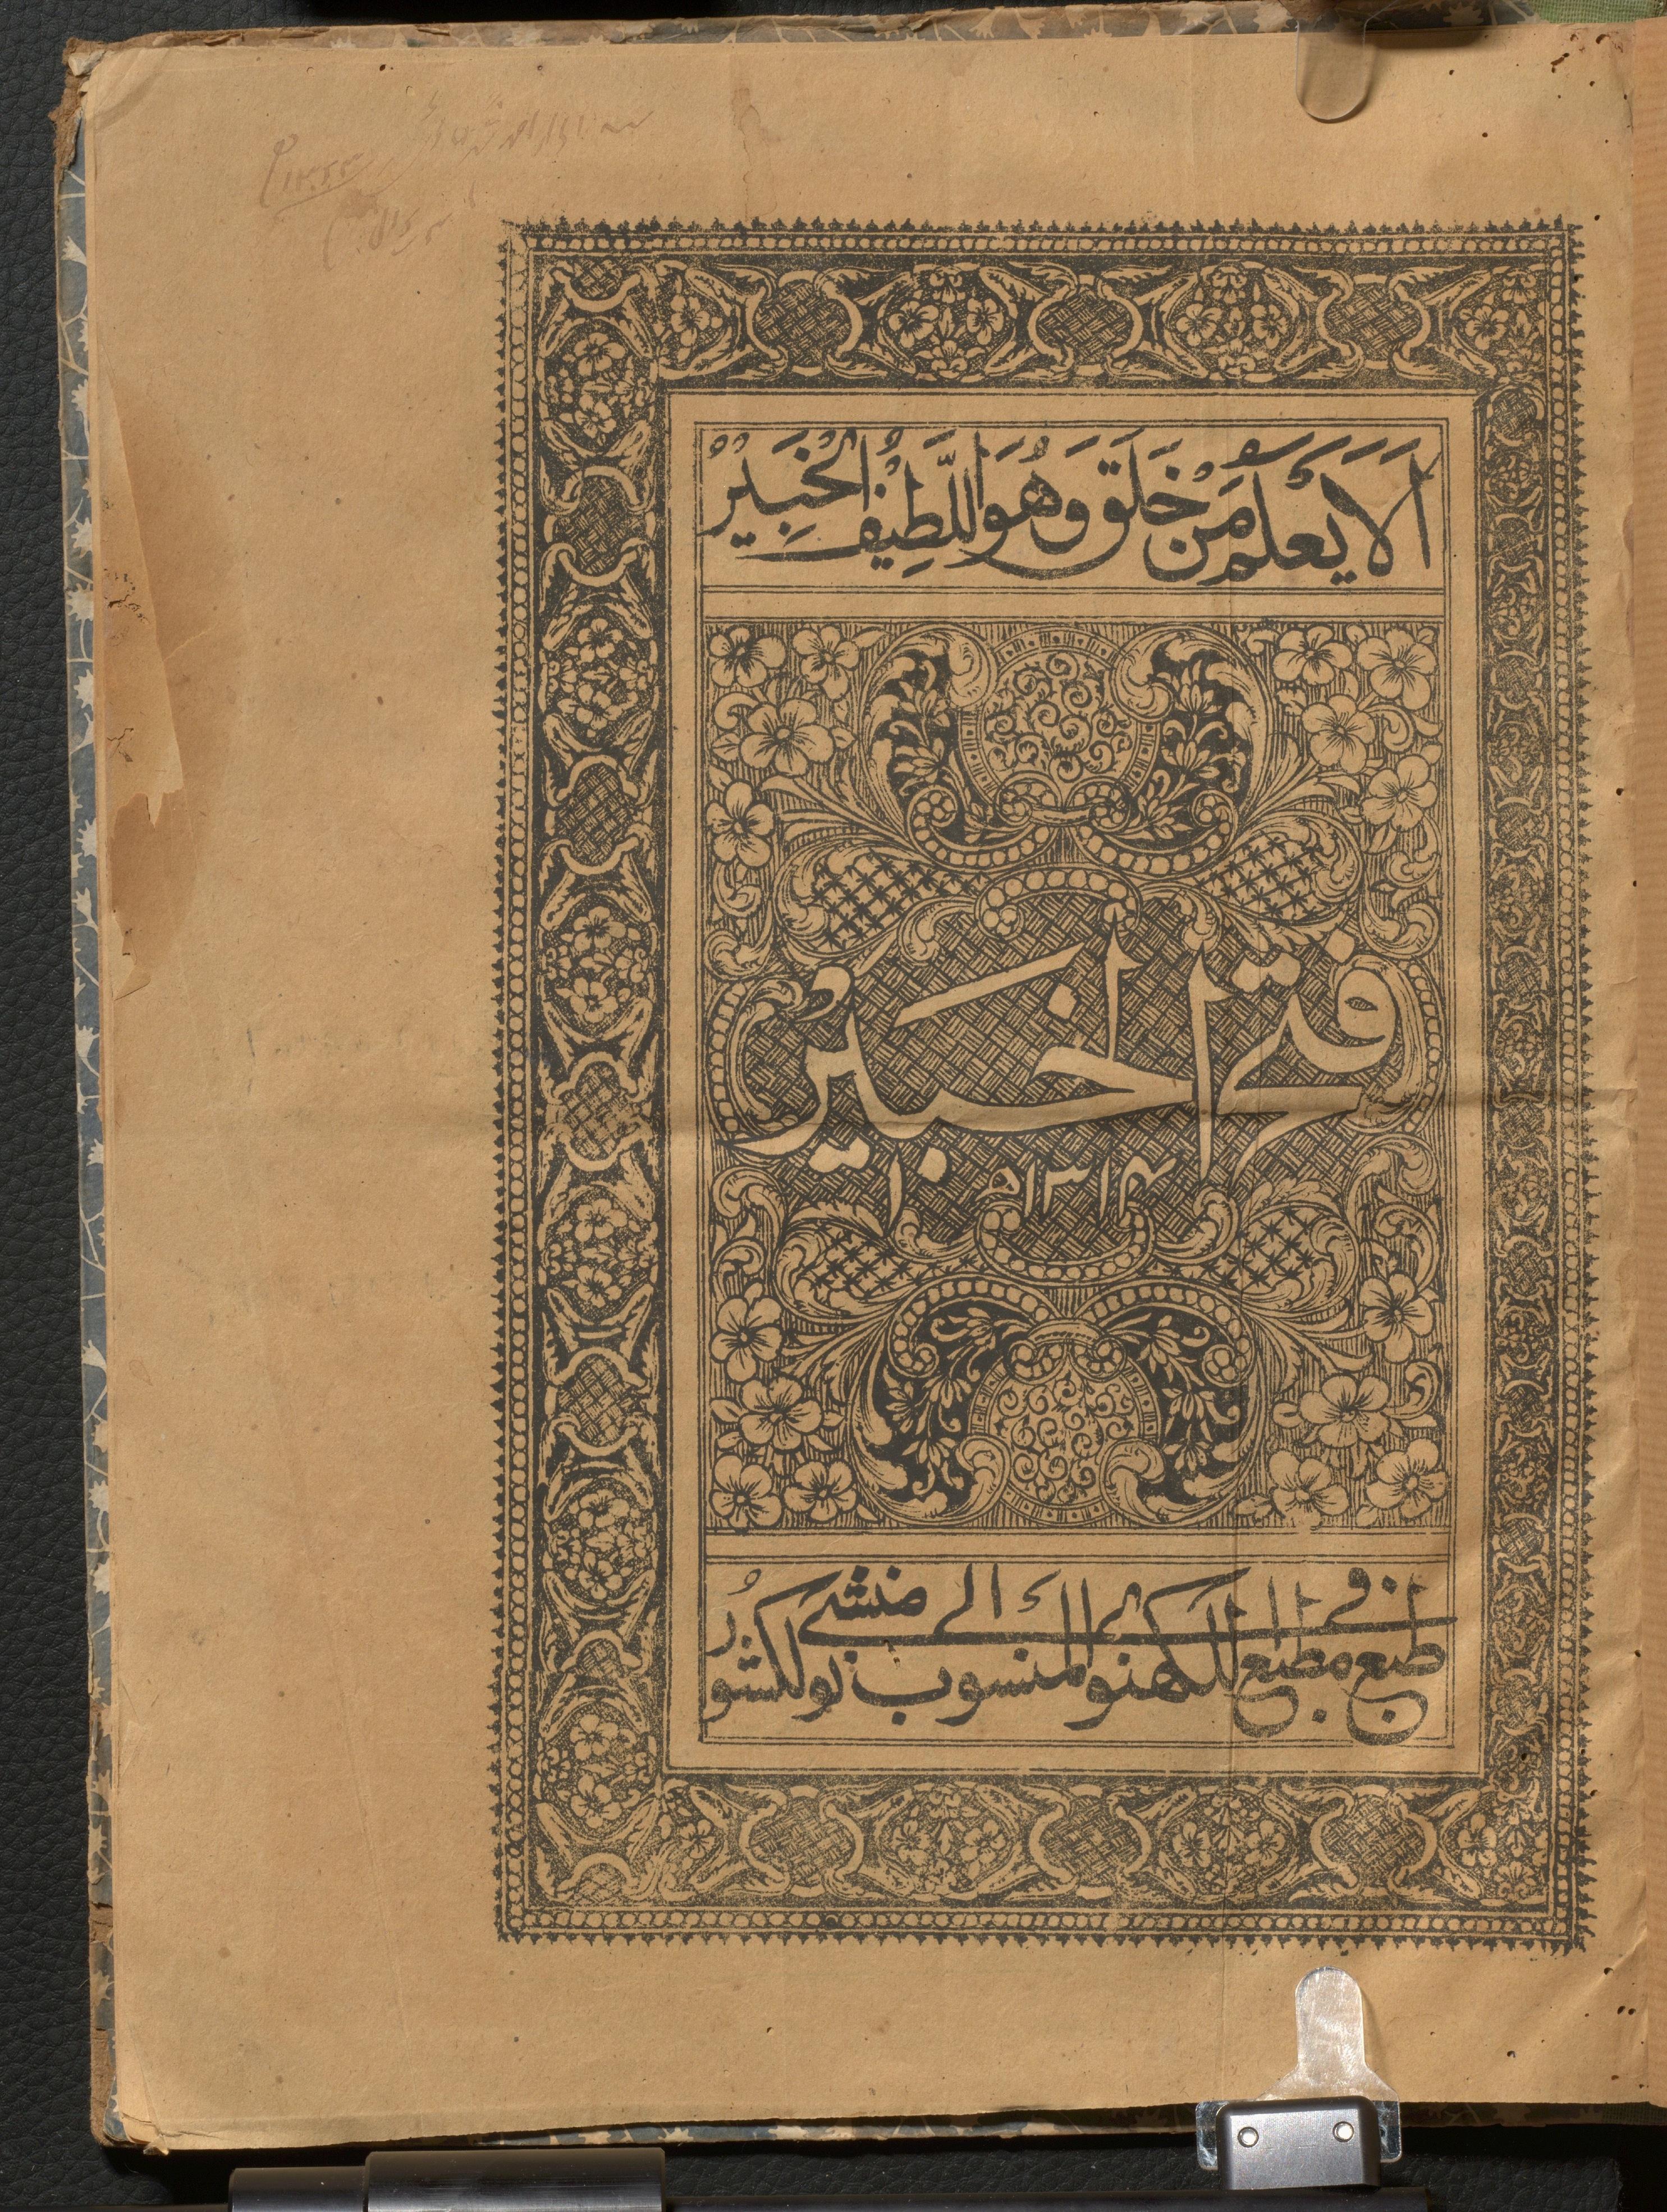 Walī Allāh al-Dihlawī, 1702 or 3-1762 or 3. Fatḥ al-khabīr. Lak hana'u : Munshī Nawal Kishūr, 1314 [1896 or 1897].